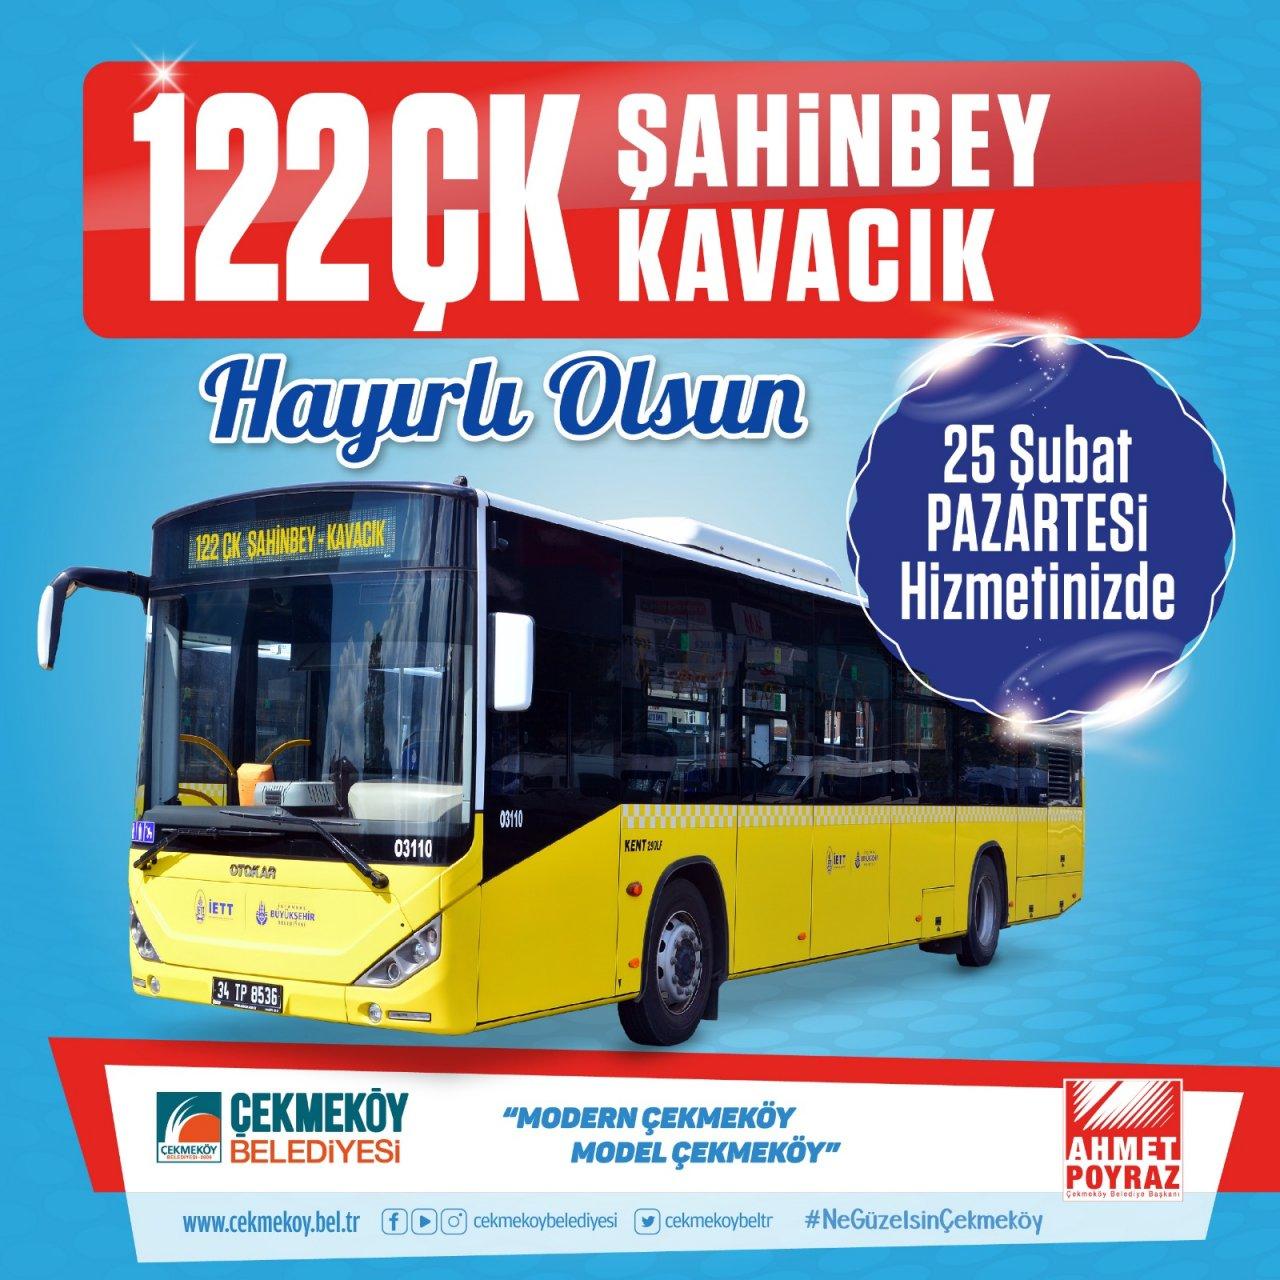 122-ck-sahinbey-kavacik-hatti